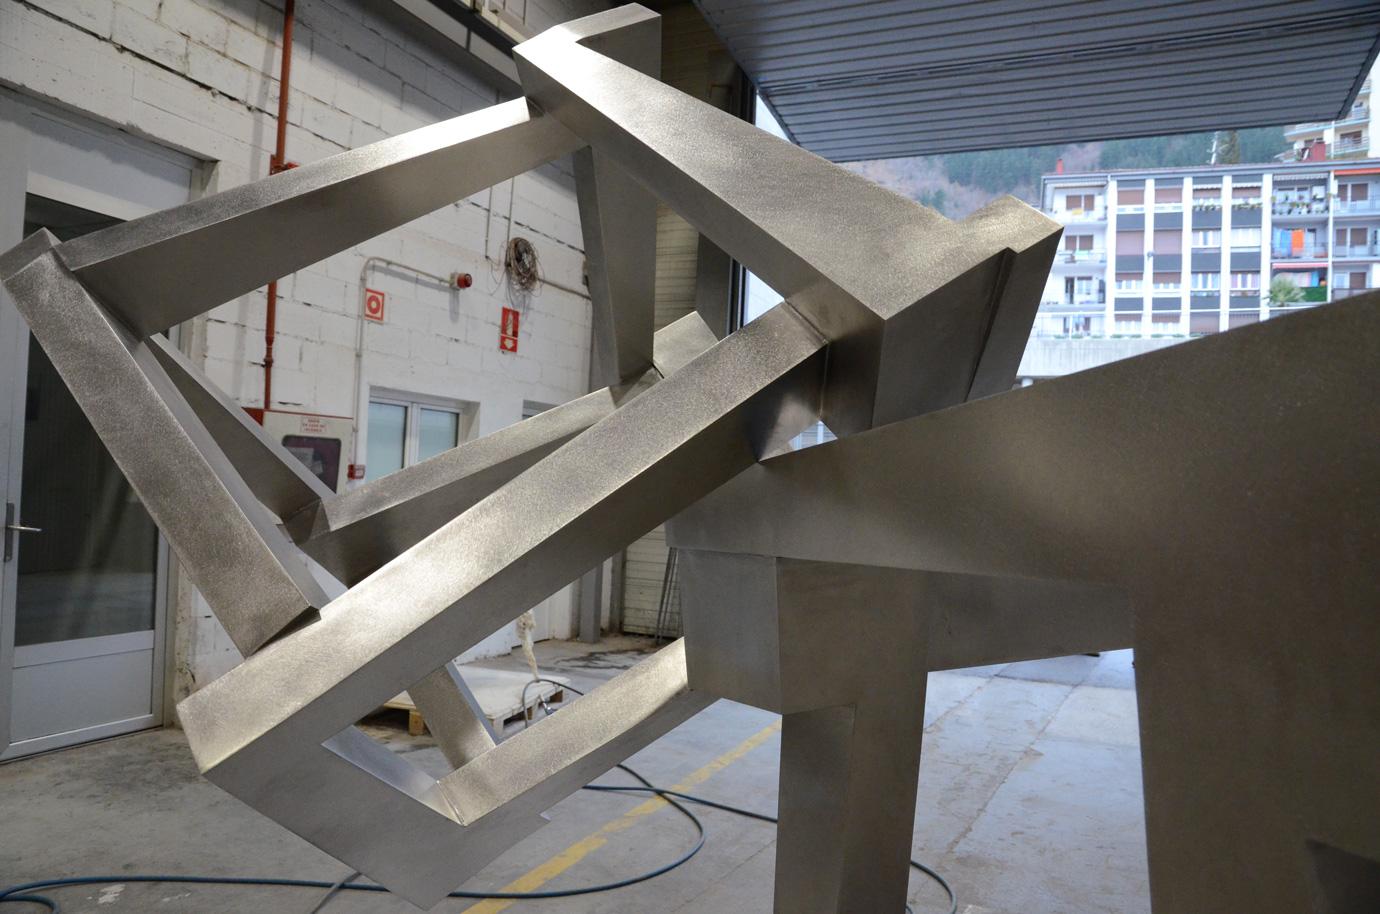 CHAOS TECTONICS, obra de Jedd Novatt, en acero inoxidable, construida en Alfa Arte